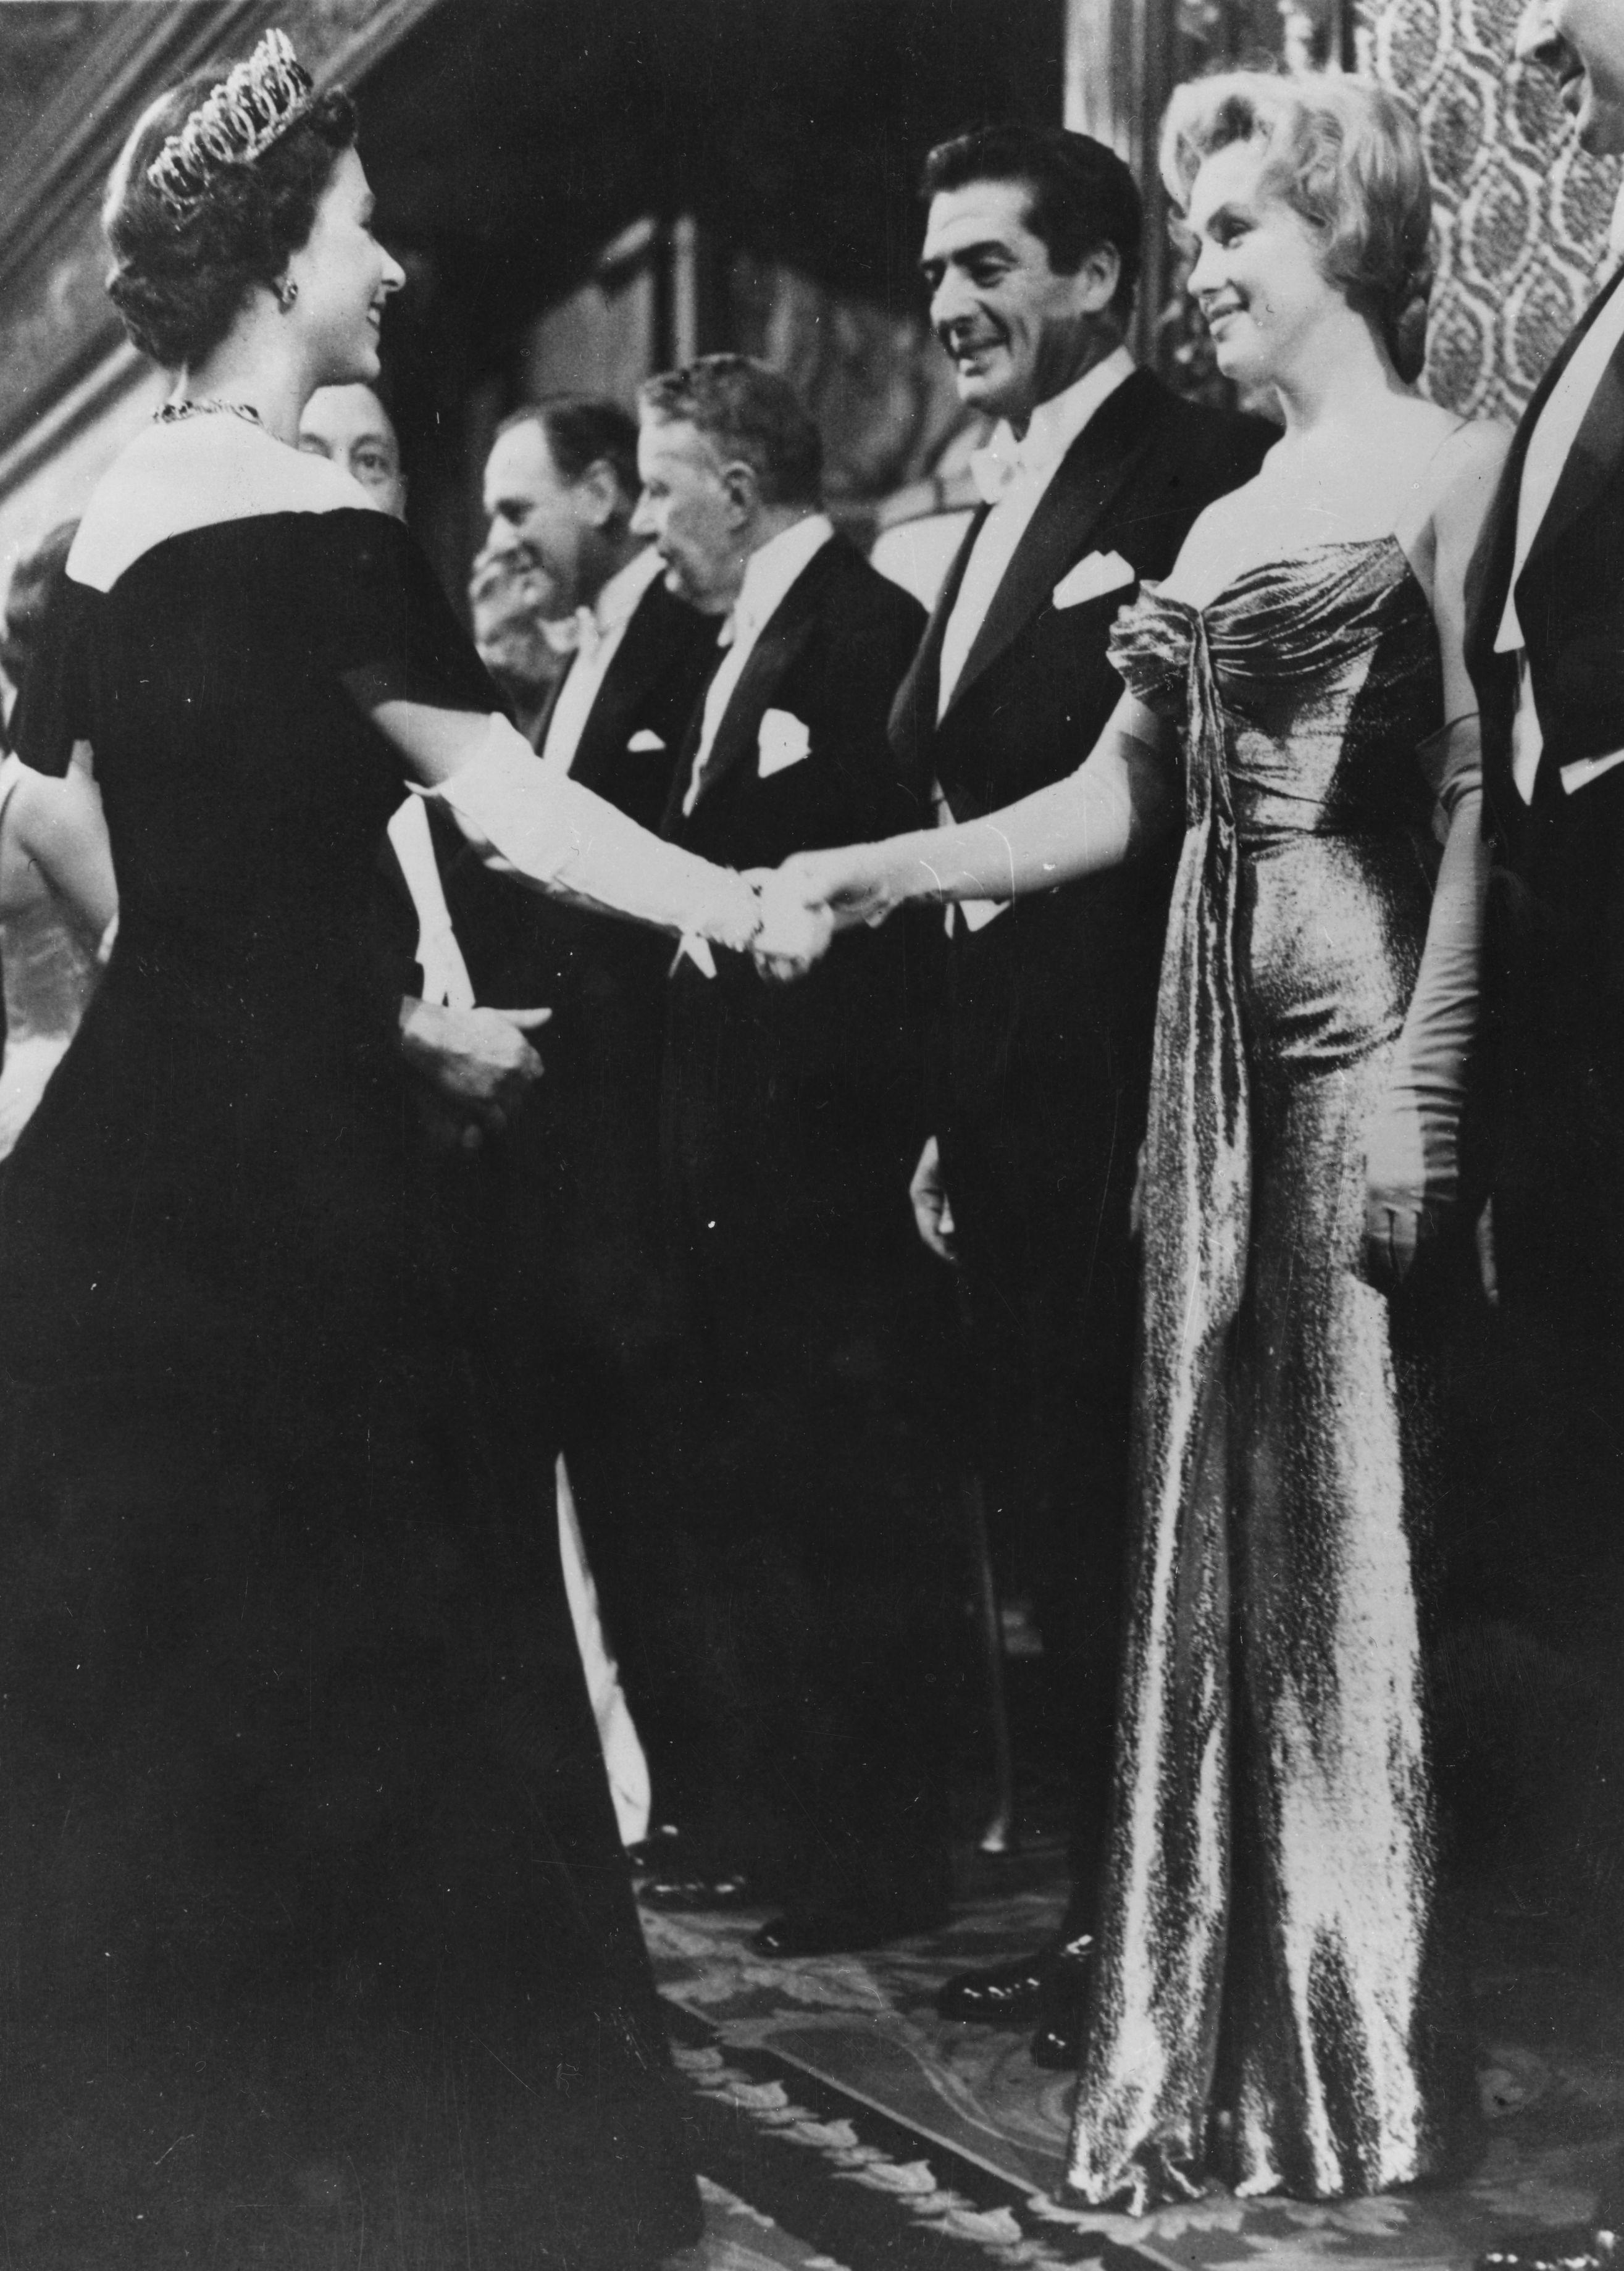 Queen Elizabeth Marilyn Monroe Getty Images